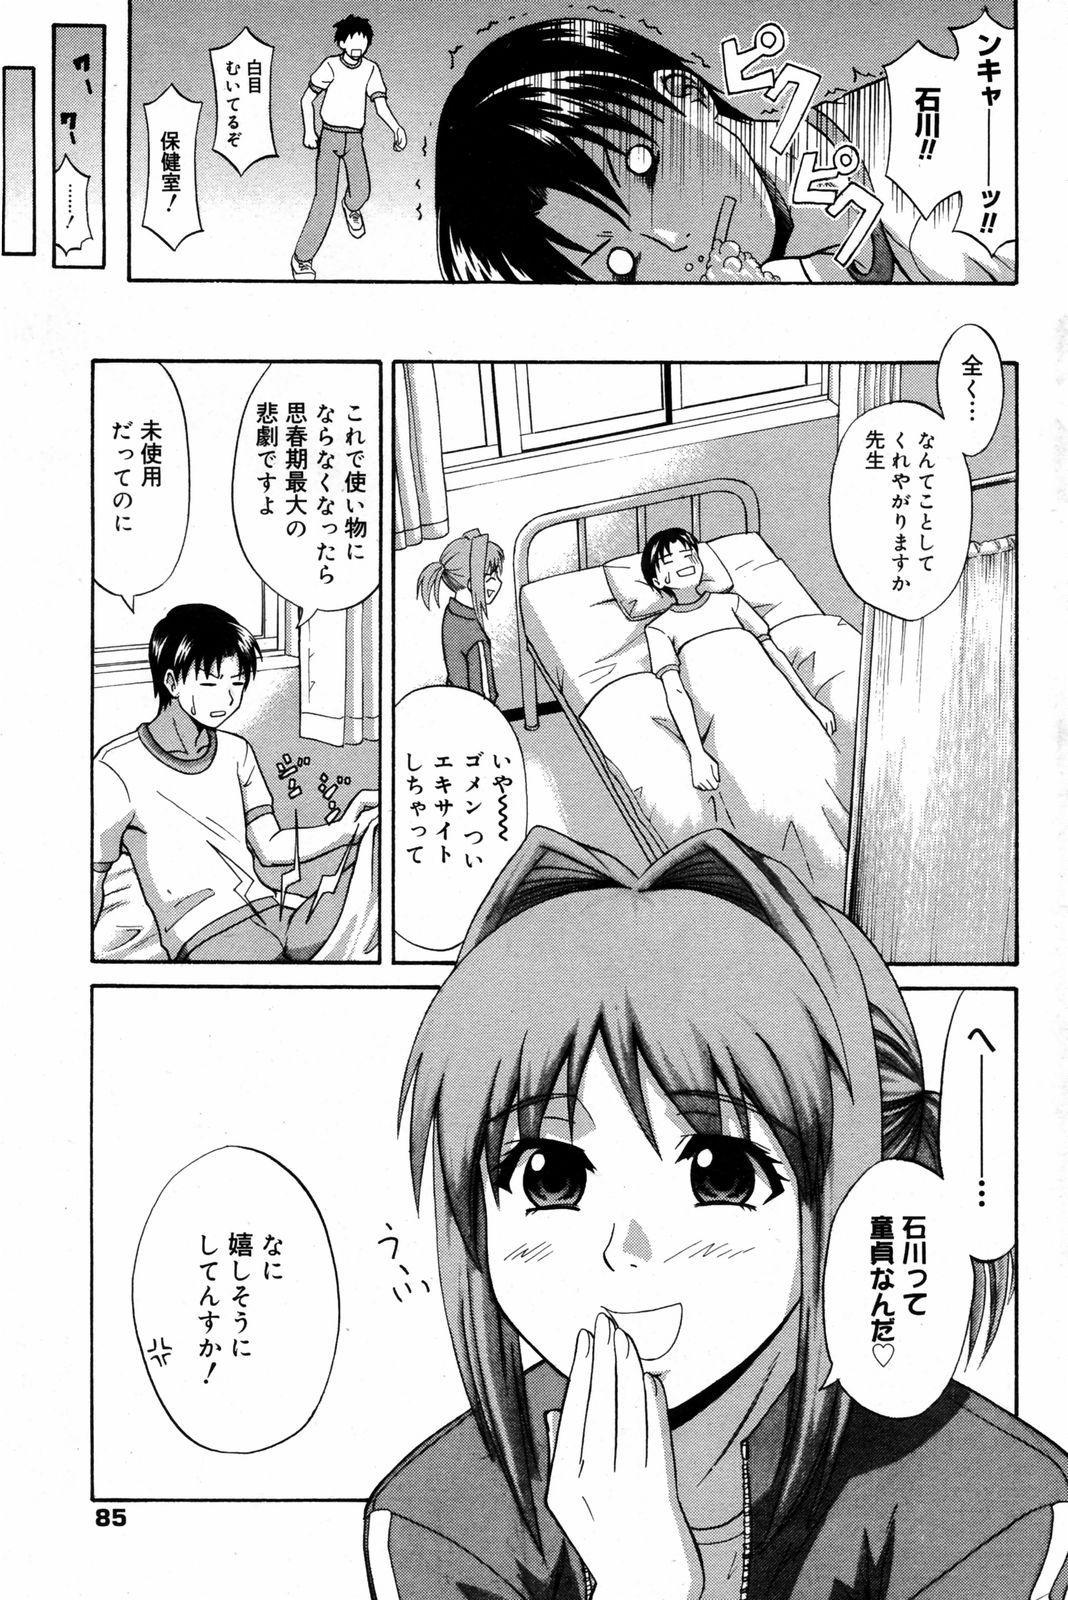 Manga Bangaichi 2008-03 84